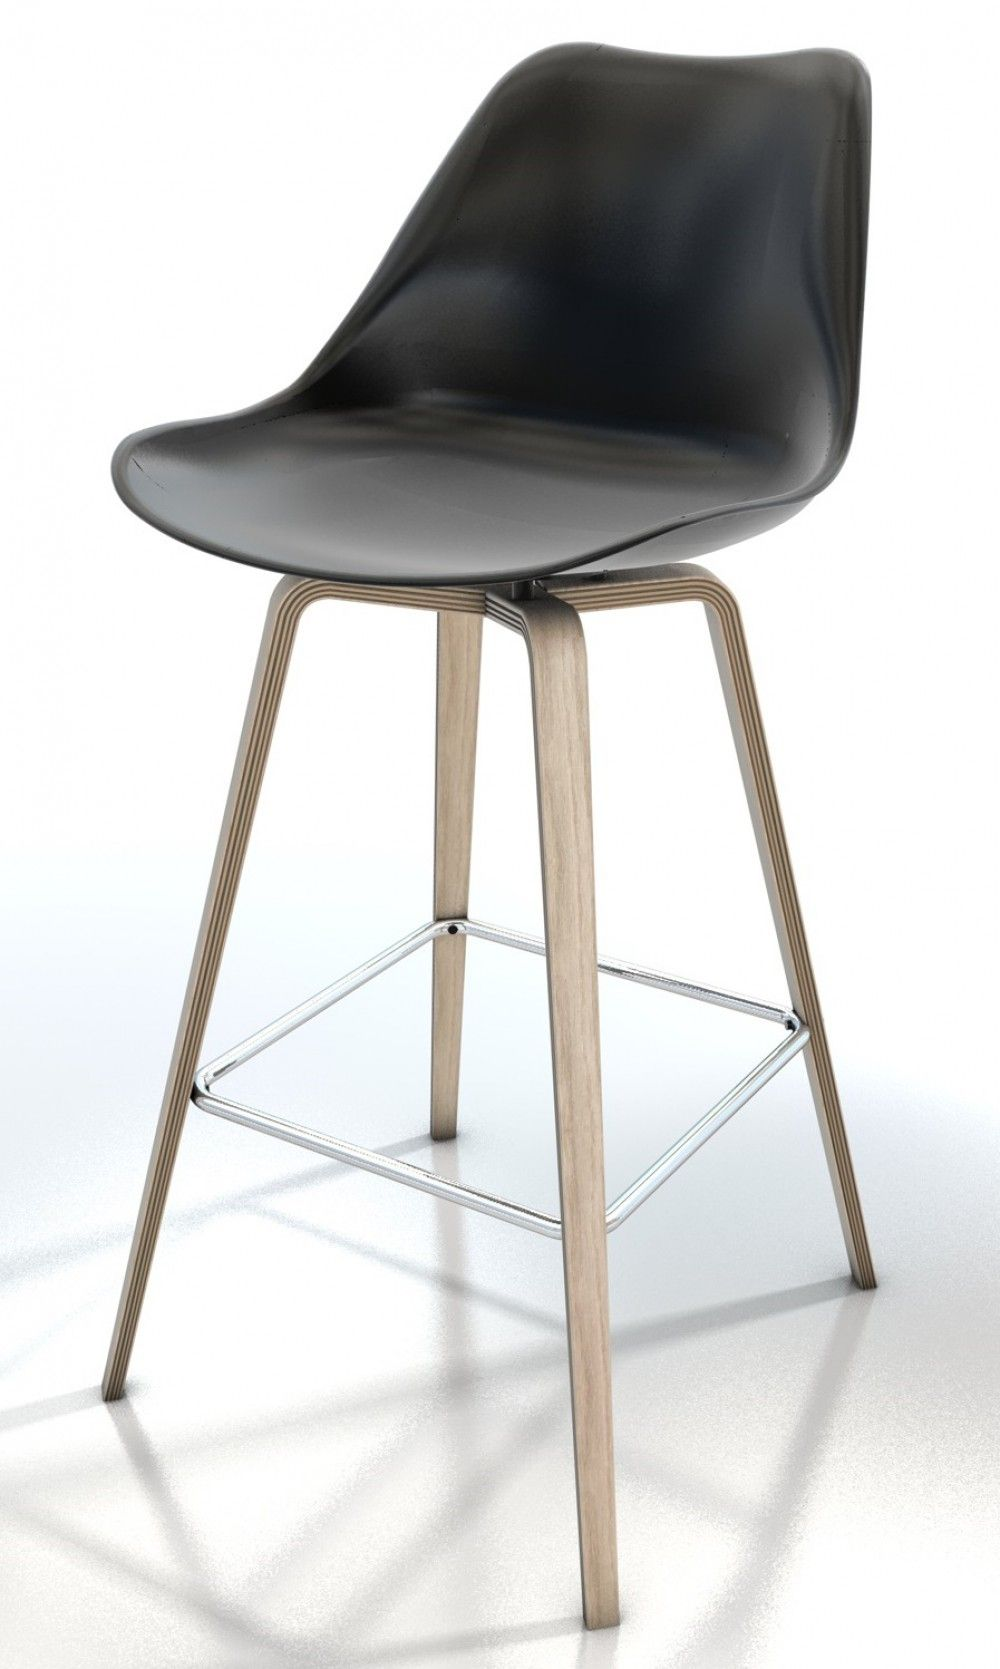 Barhocker Schwarz, Barstuhl gepolstert, Sitzhöhe ca. 70 cm ...